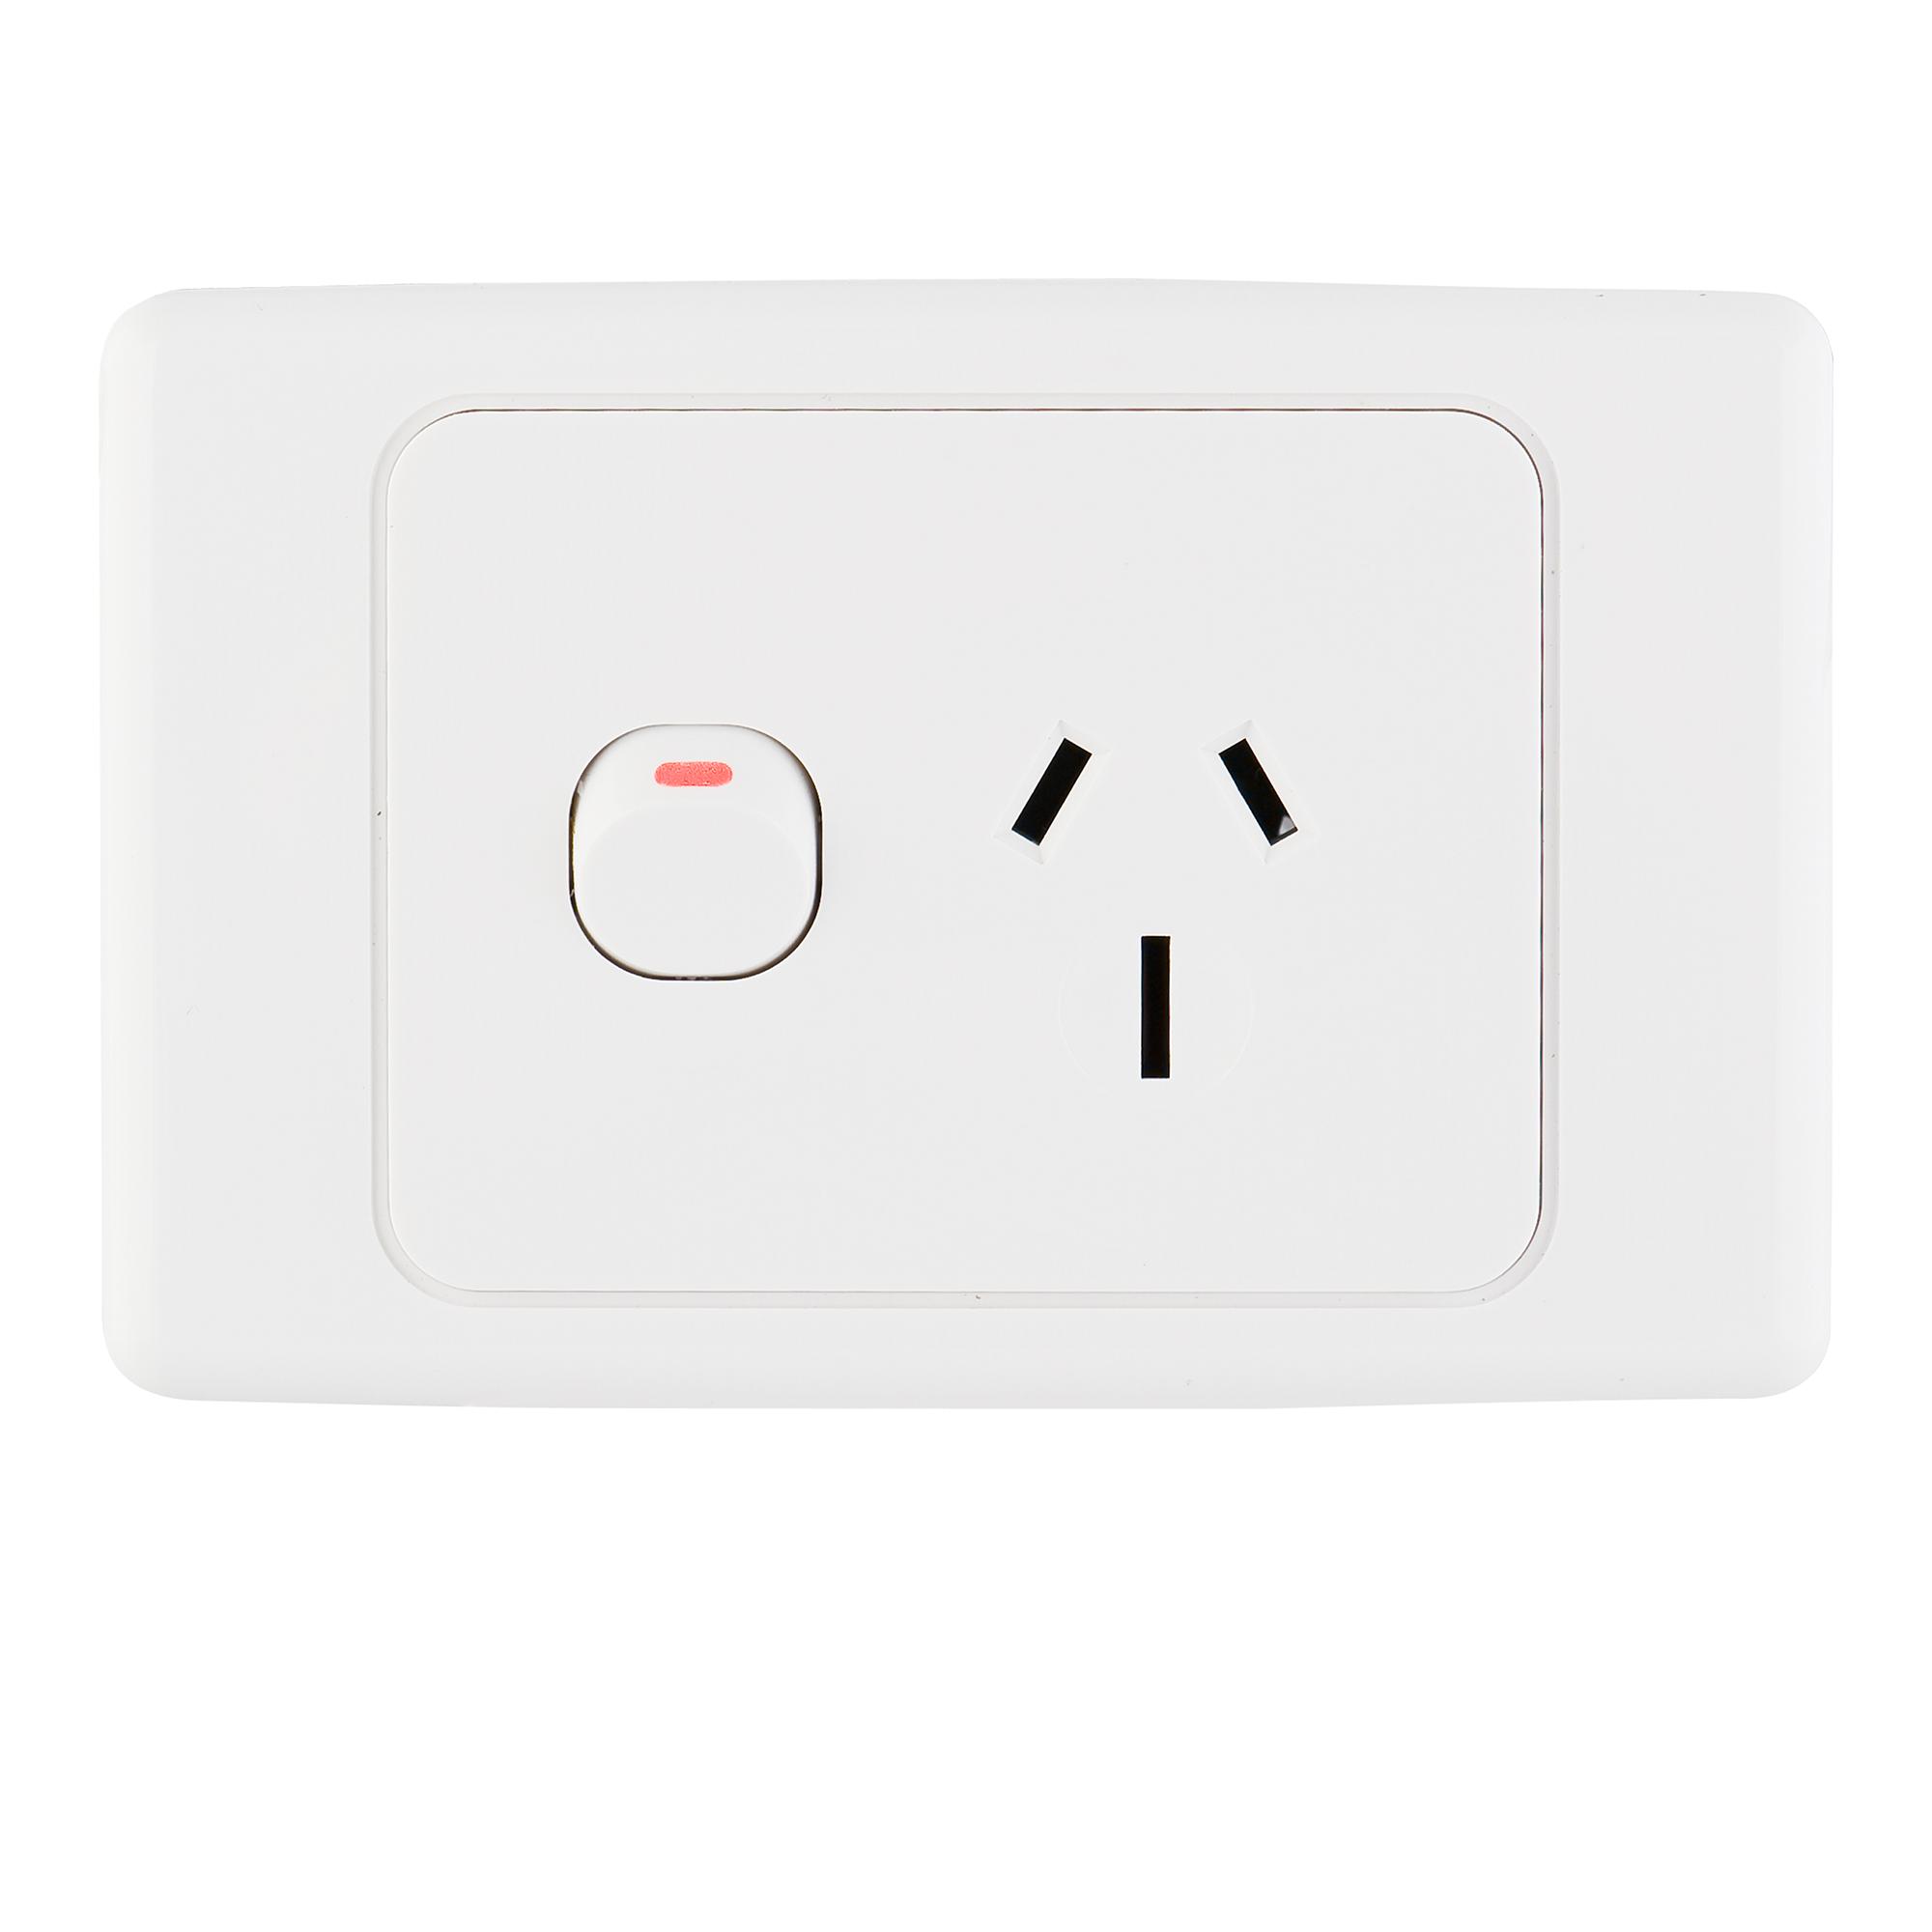 Deta 15a single power point